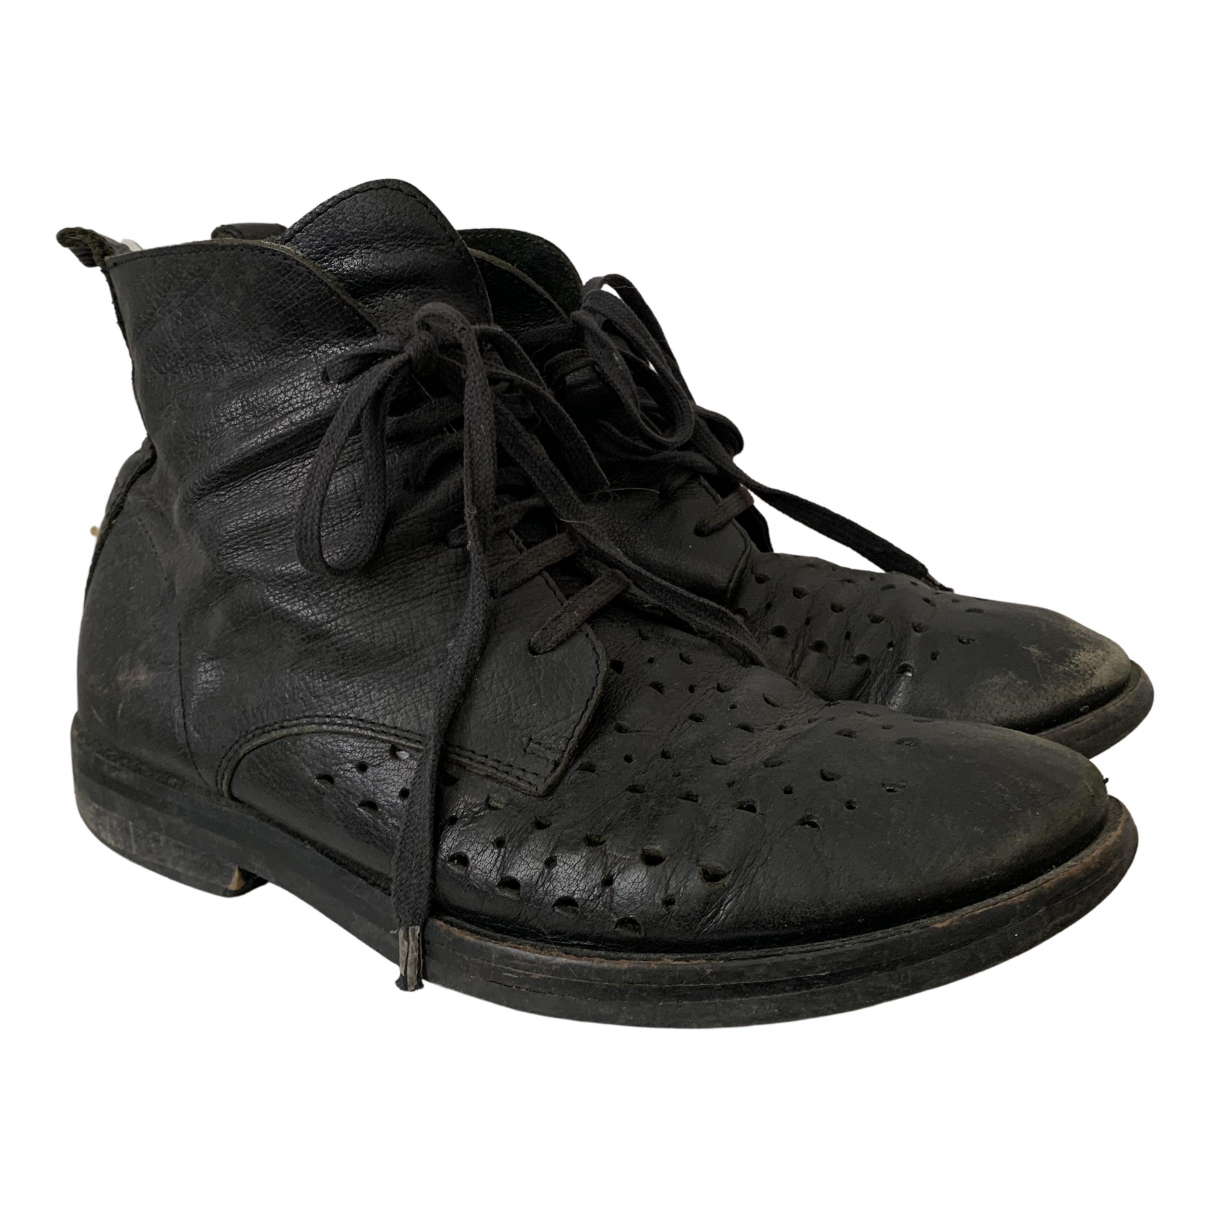 Ann Demeulemeester - Boots   pour femme en cuir - noir